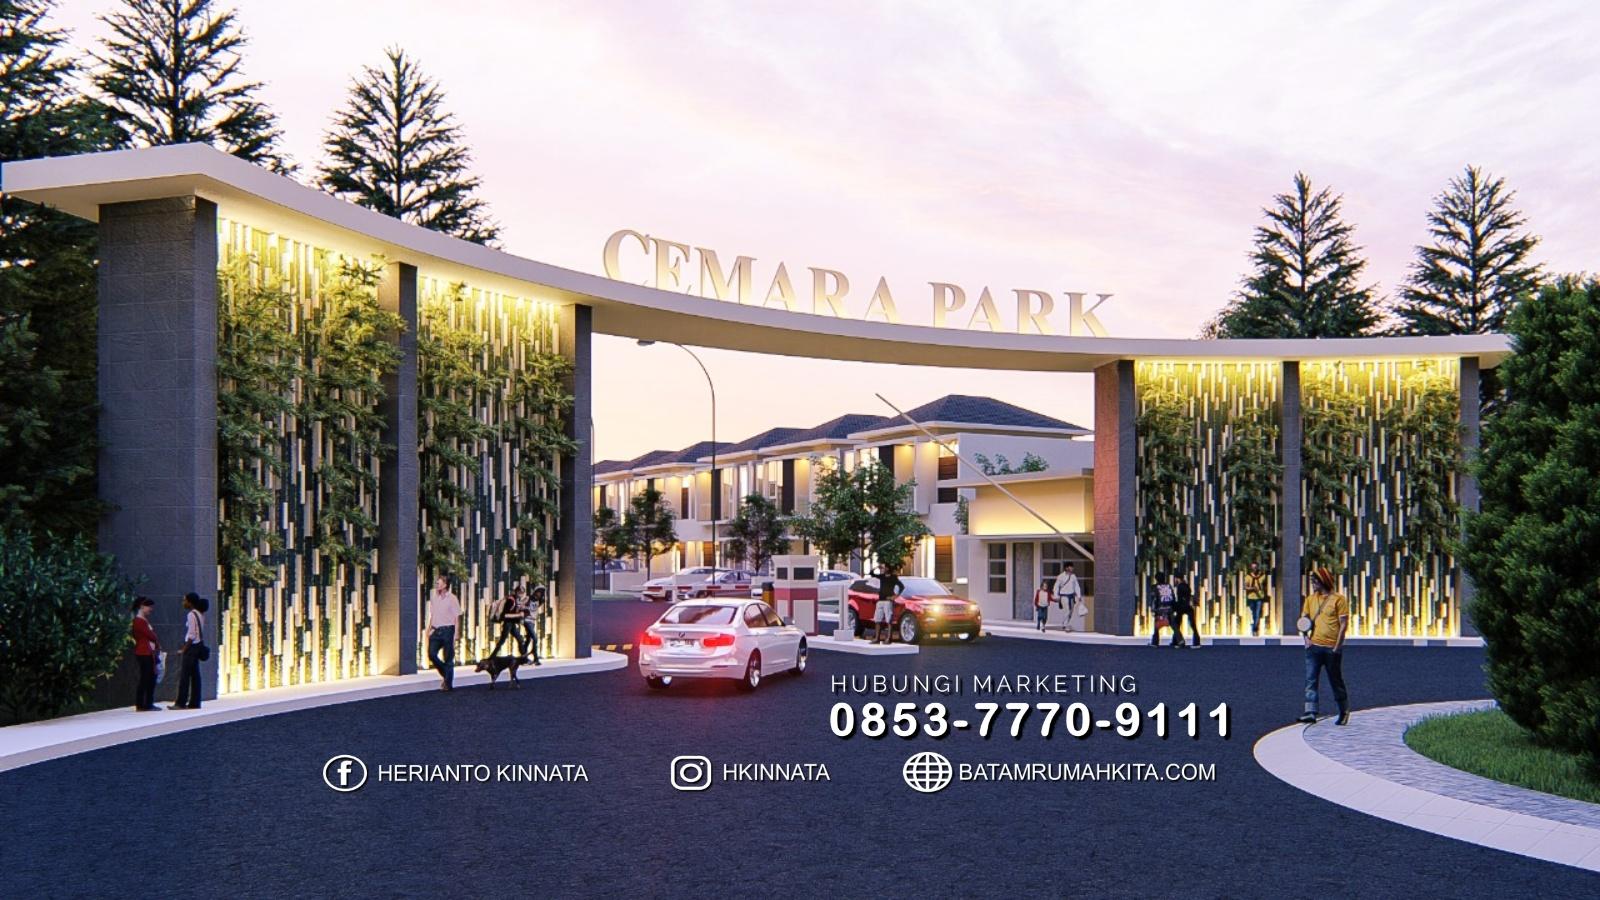 Cemara Park